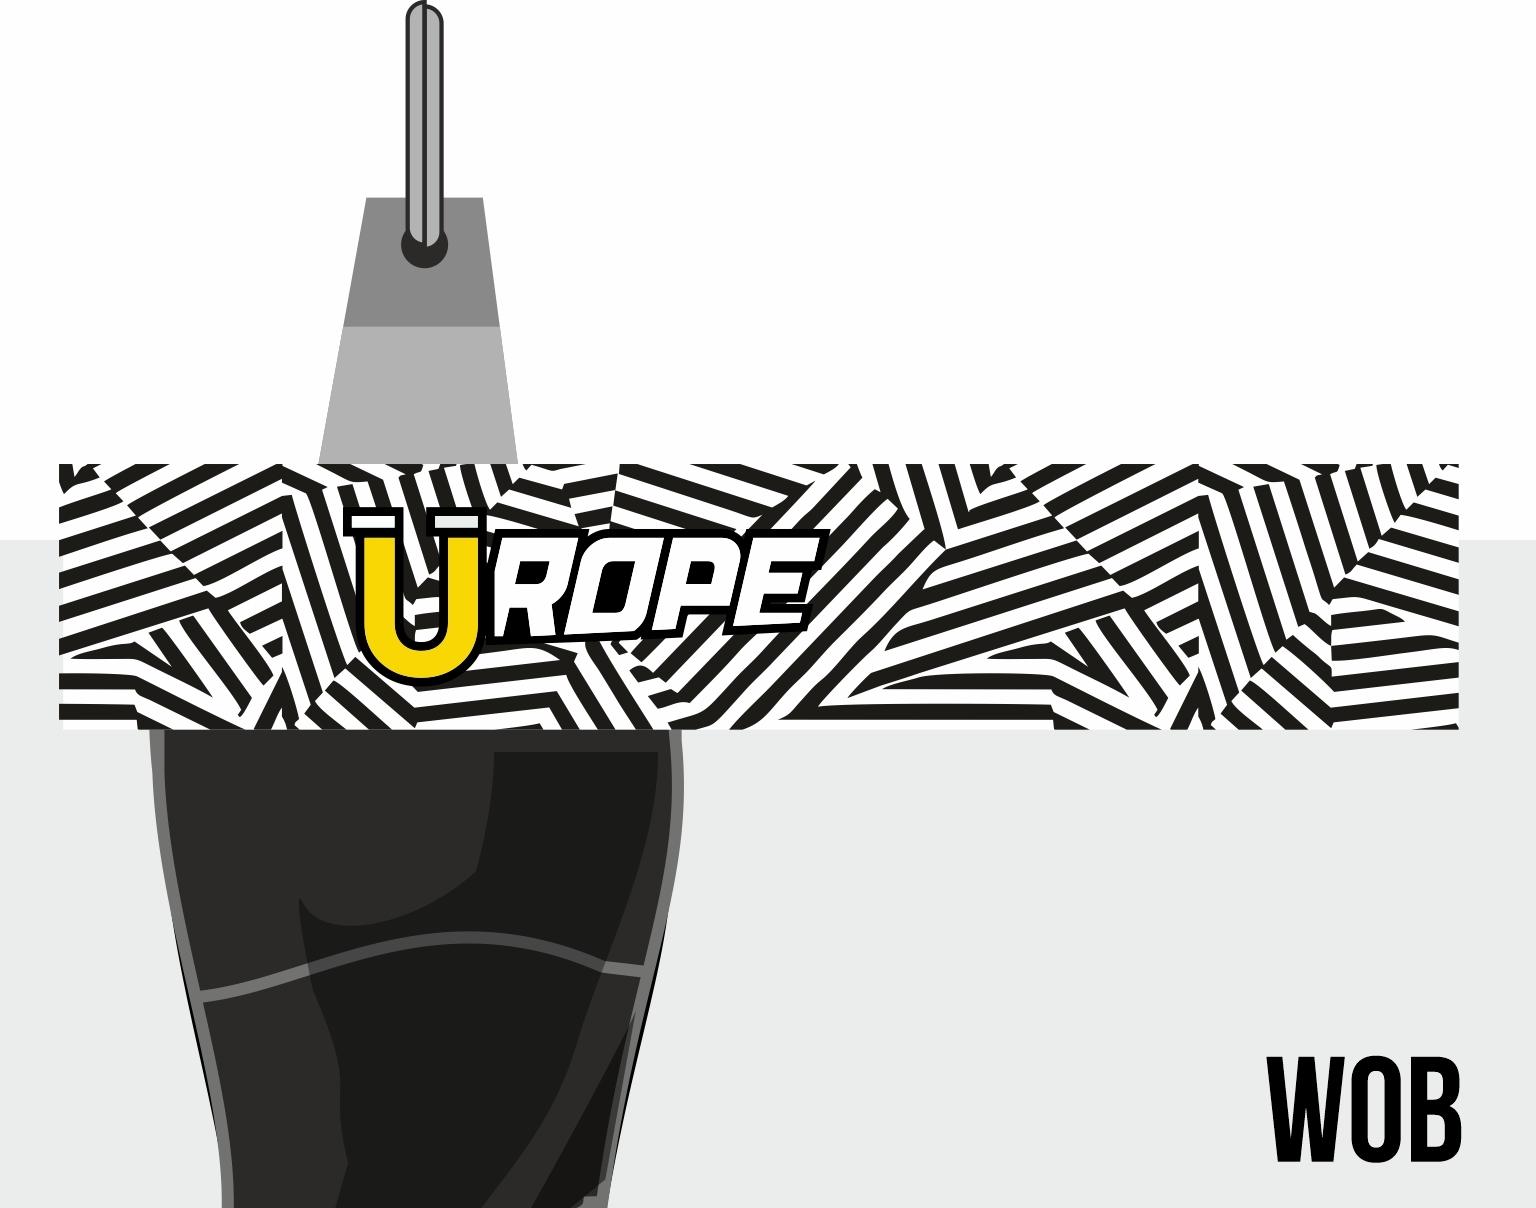 urope-wob